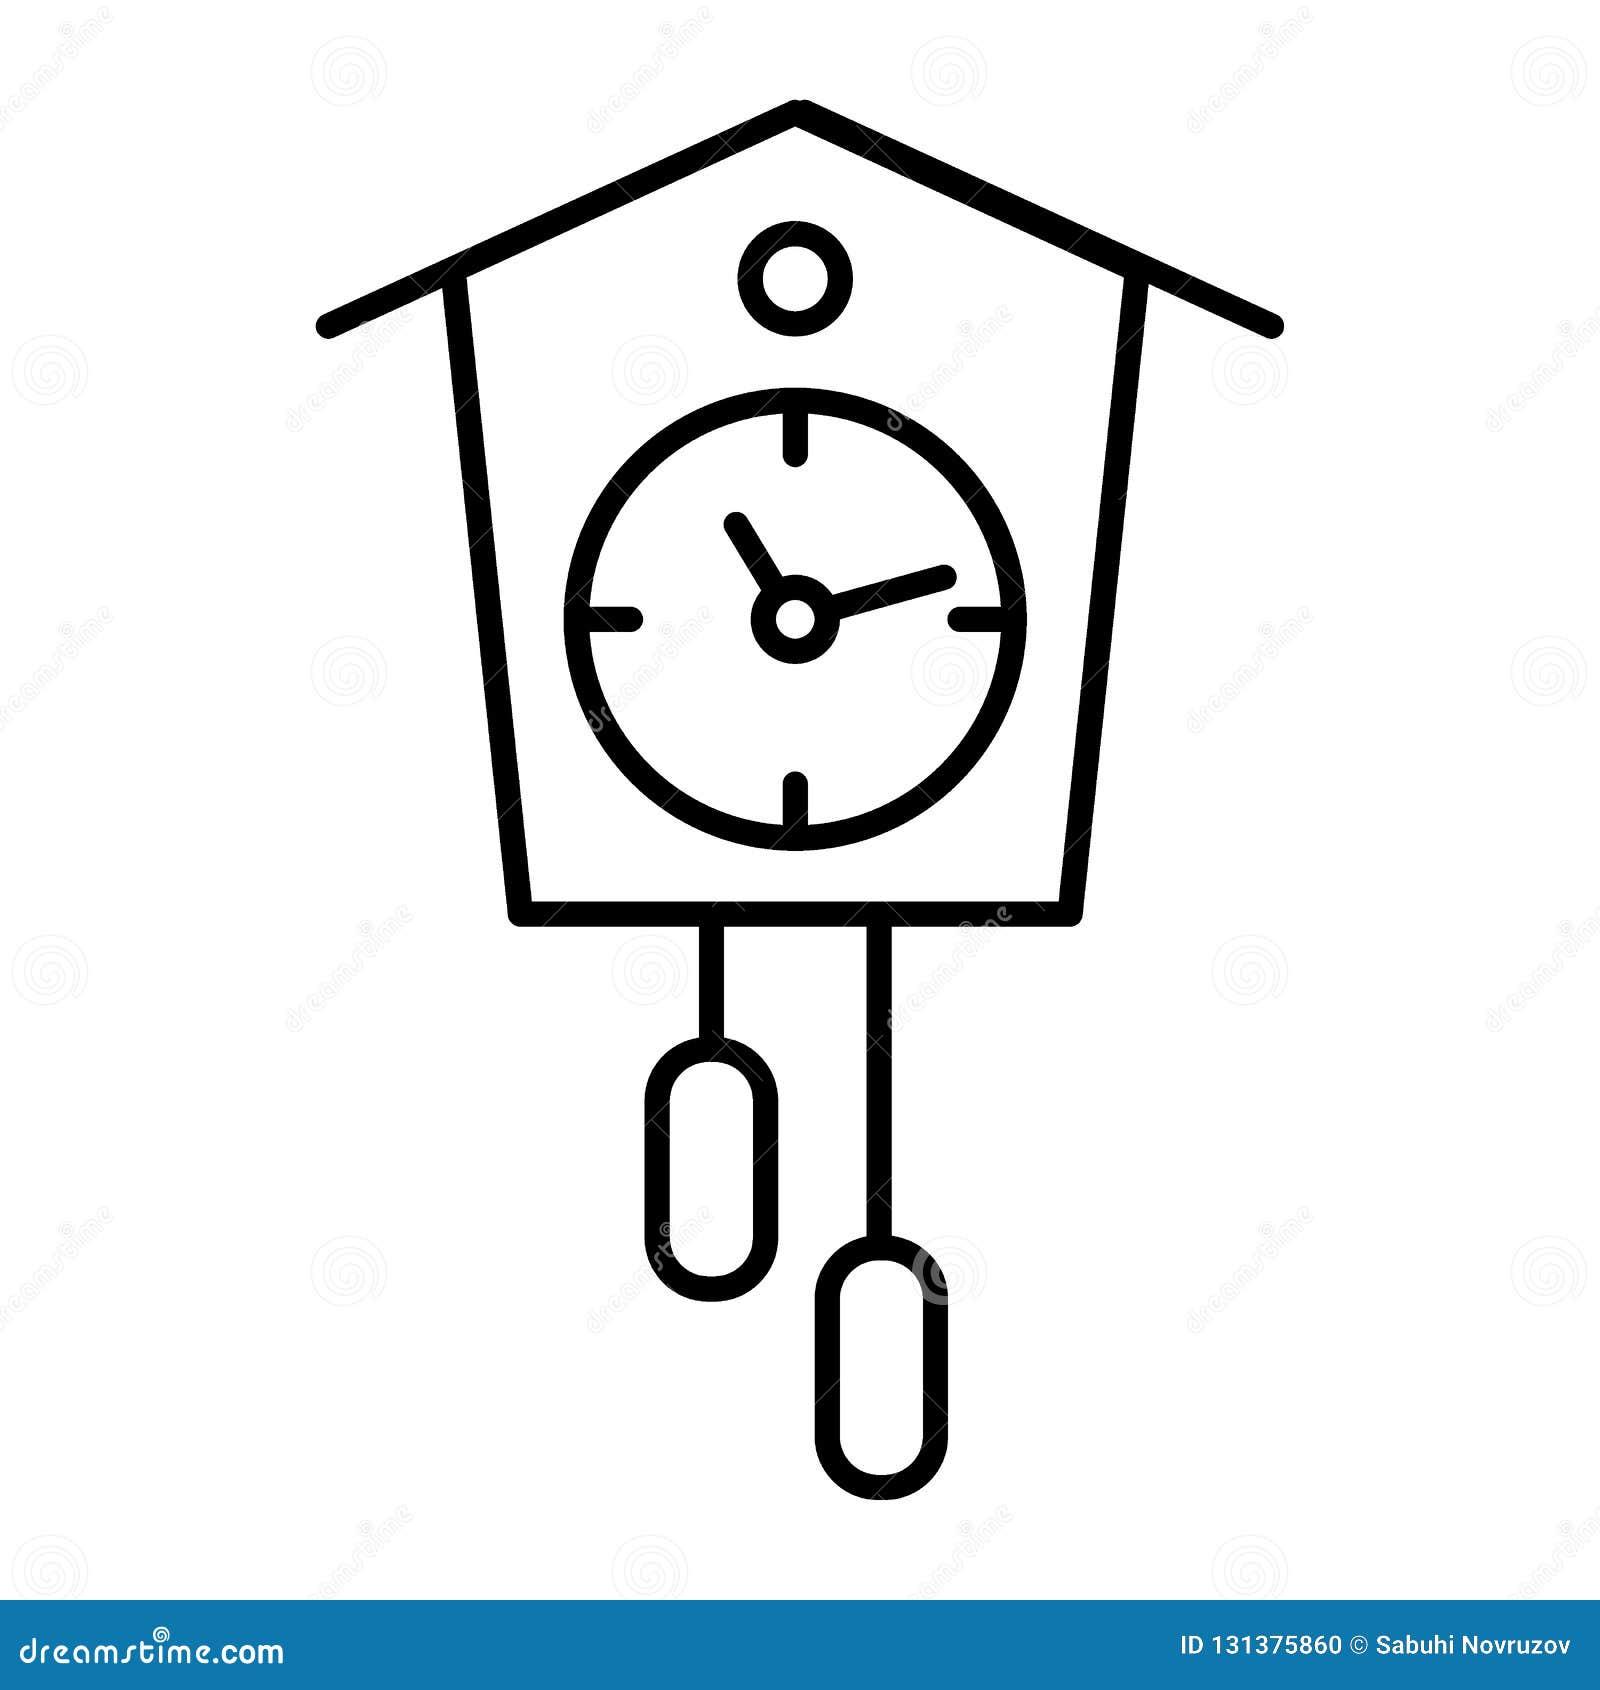 Cuckoo-clock Thin Line Icon  Old Clock Vector Illustration